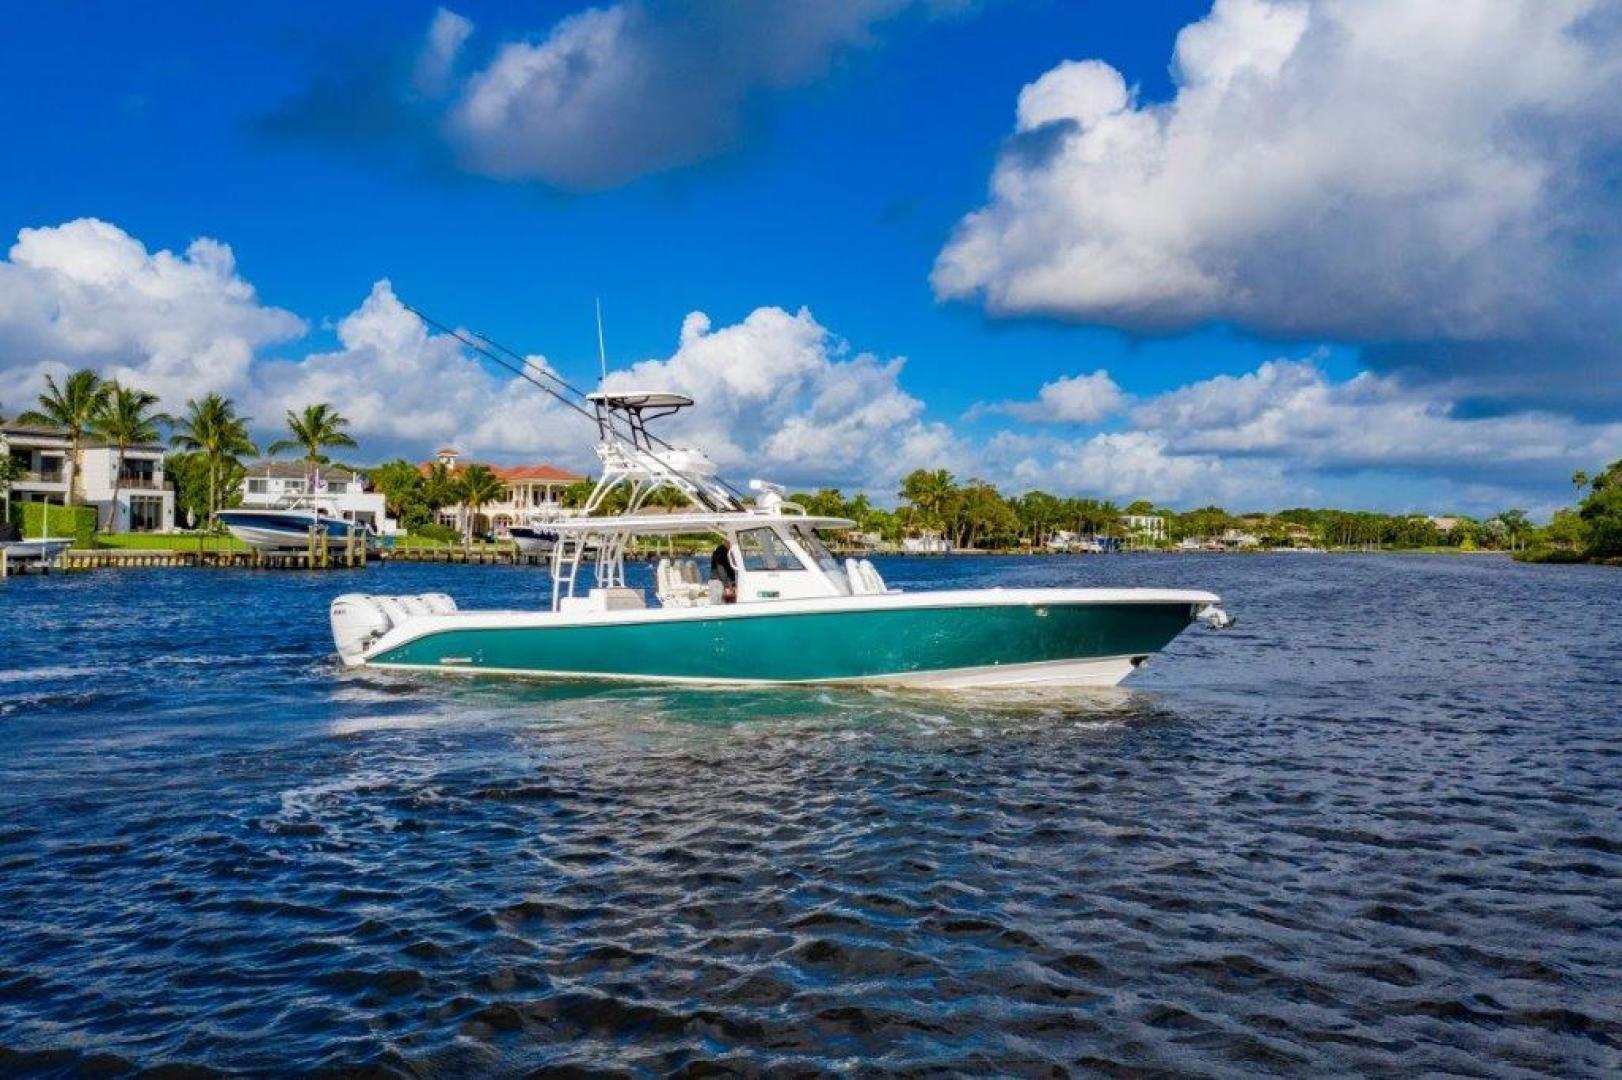 43' Everglades 2019 435 Center Console Bahama Papa